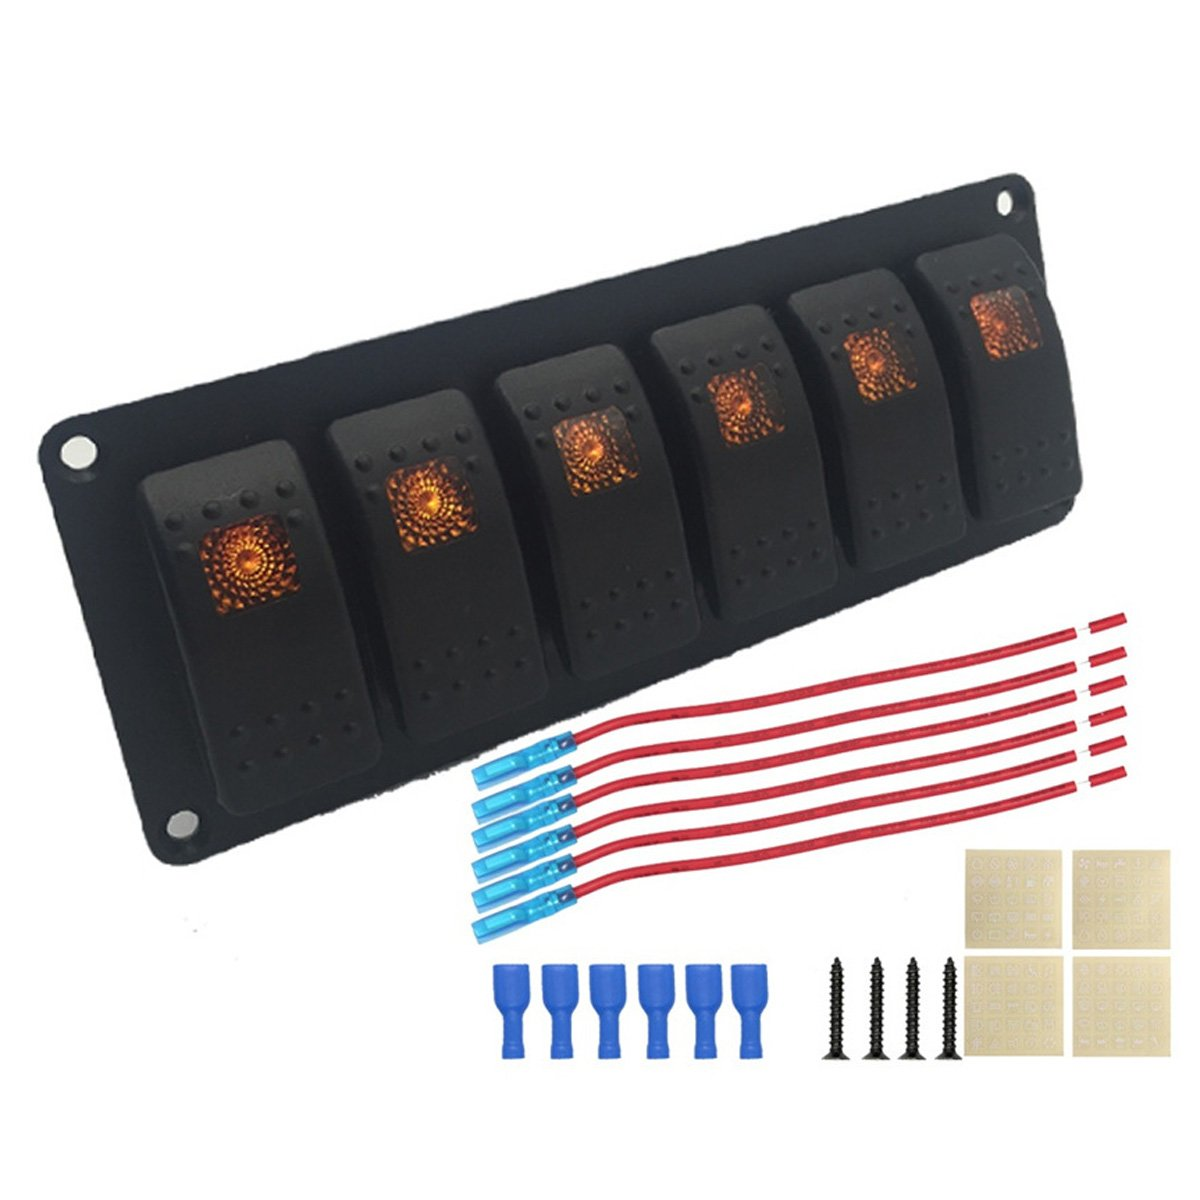 6-Group Single Lamp Aluminum Switch Panel for Car/RV/Yacht Refitting - Black, Orange